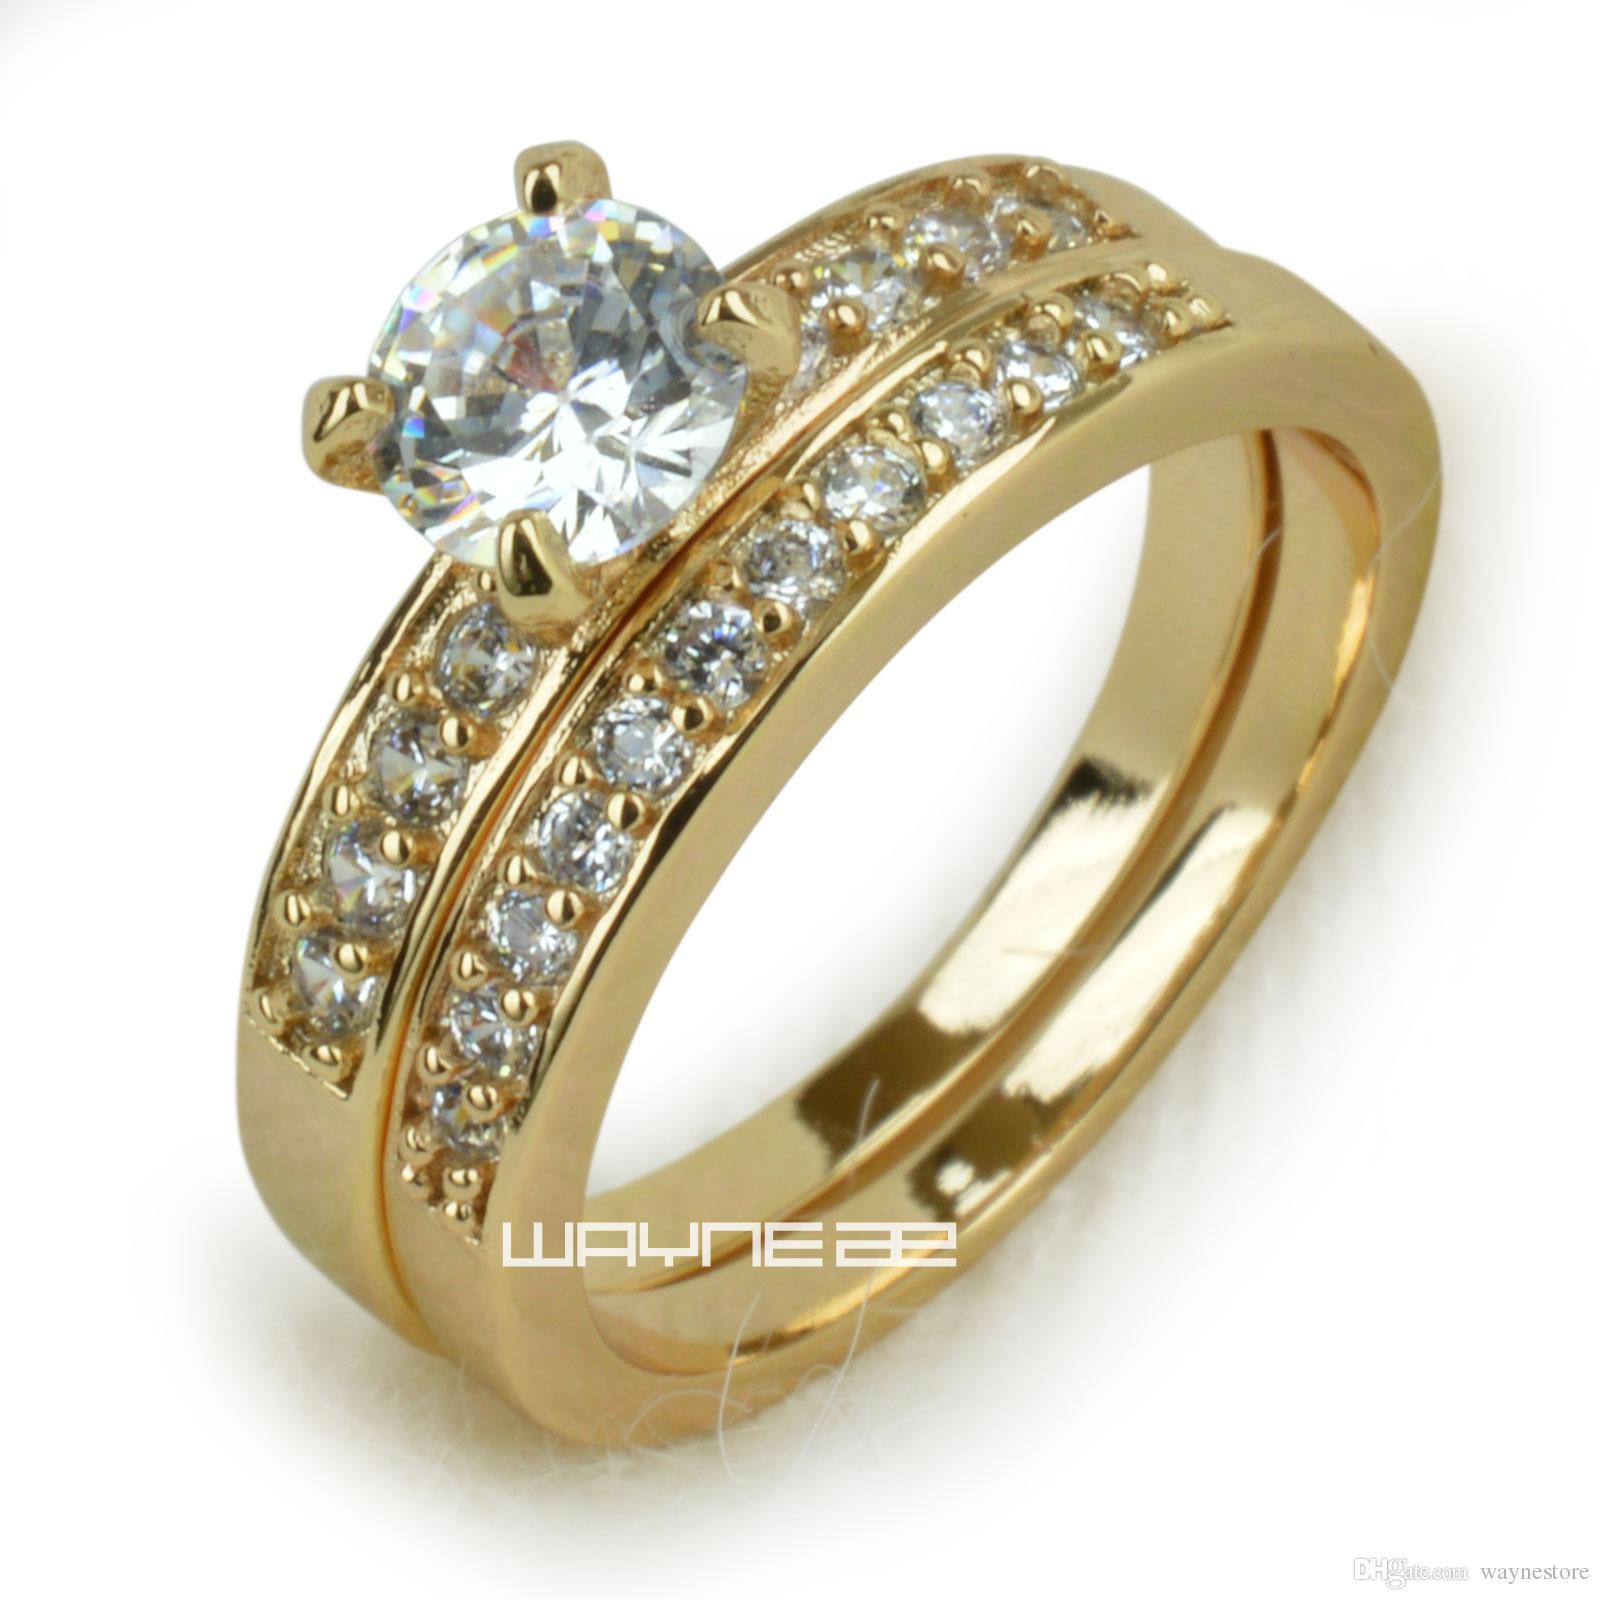 Grosshandel 18 Kt Gold Filed Womens Verlobungsring Set Lab Diamanten